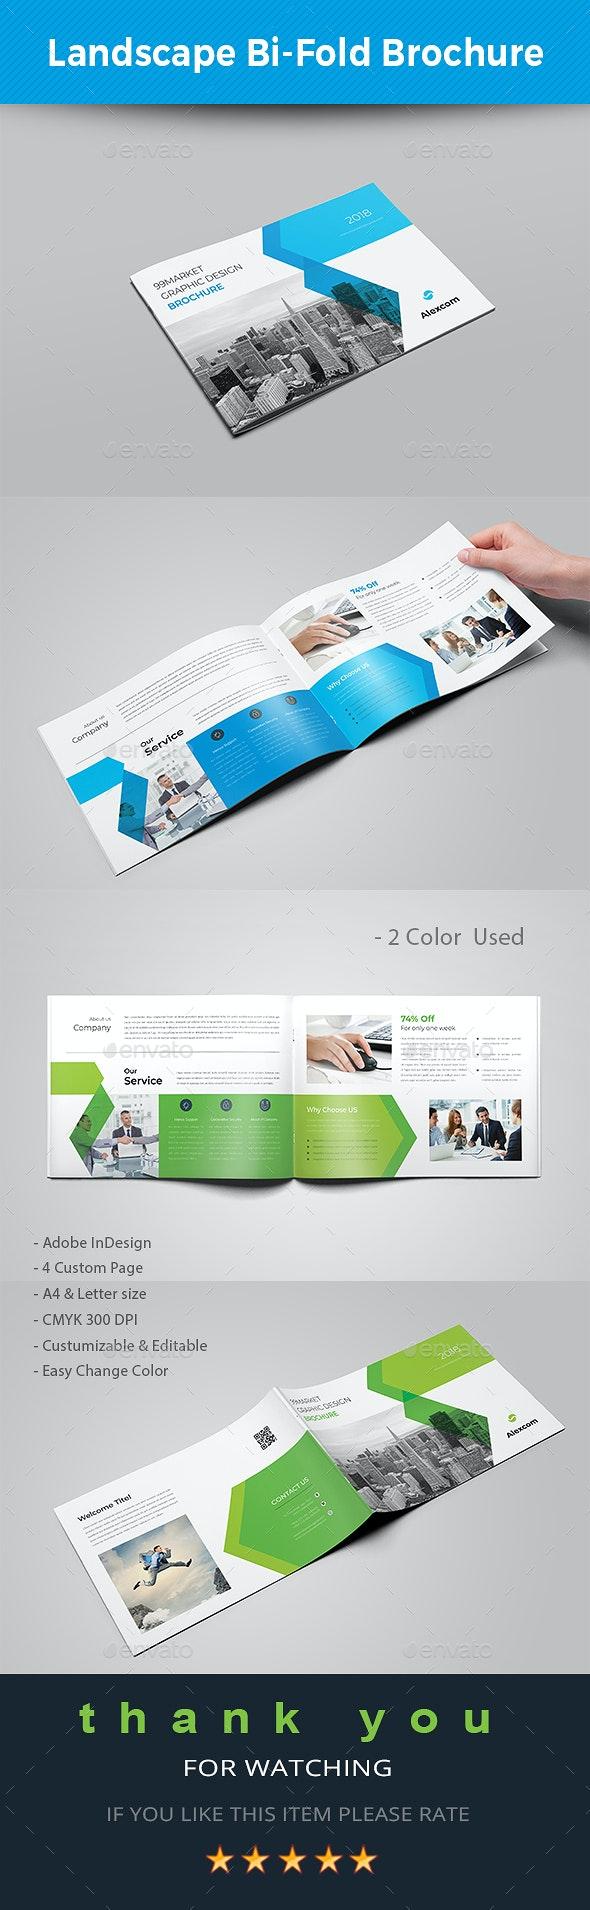 Landscape Bi-fold Brochure - Brochures Print Templates